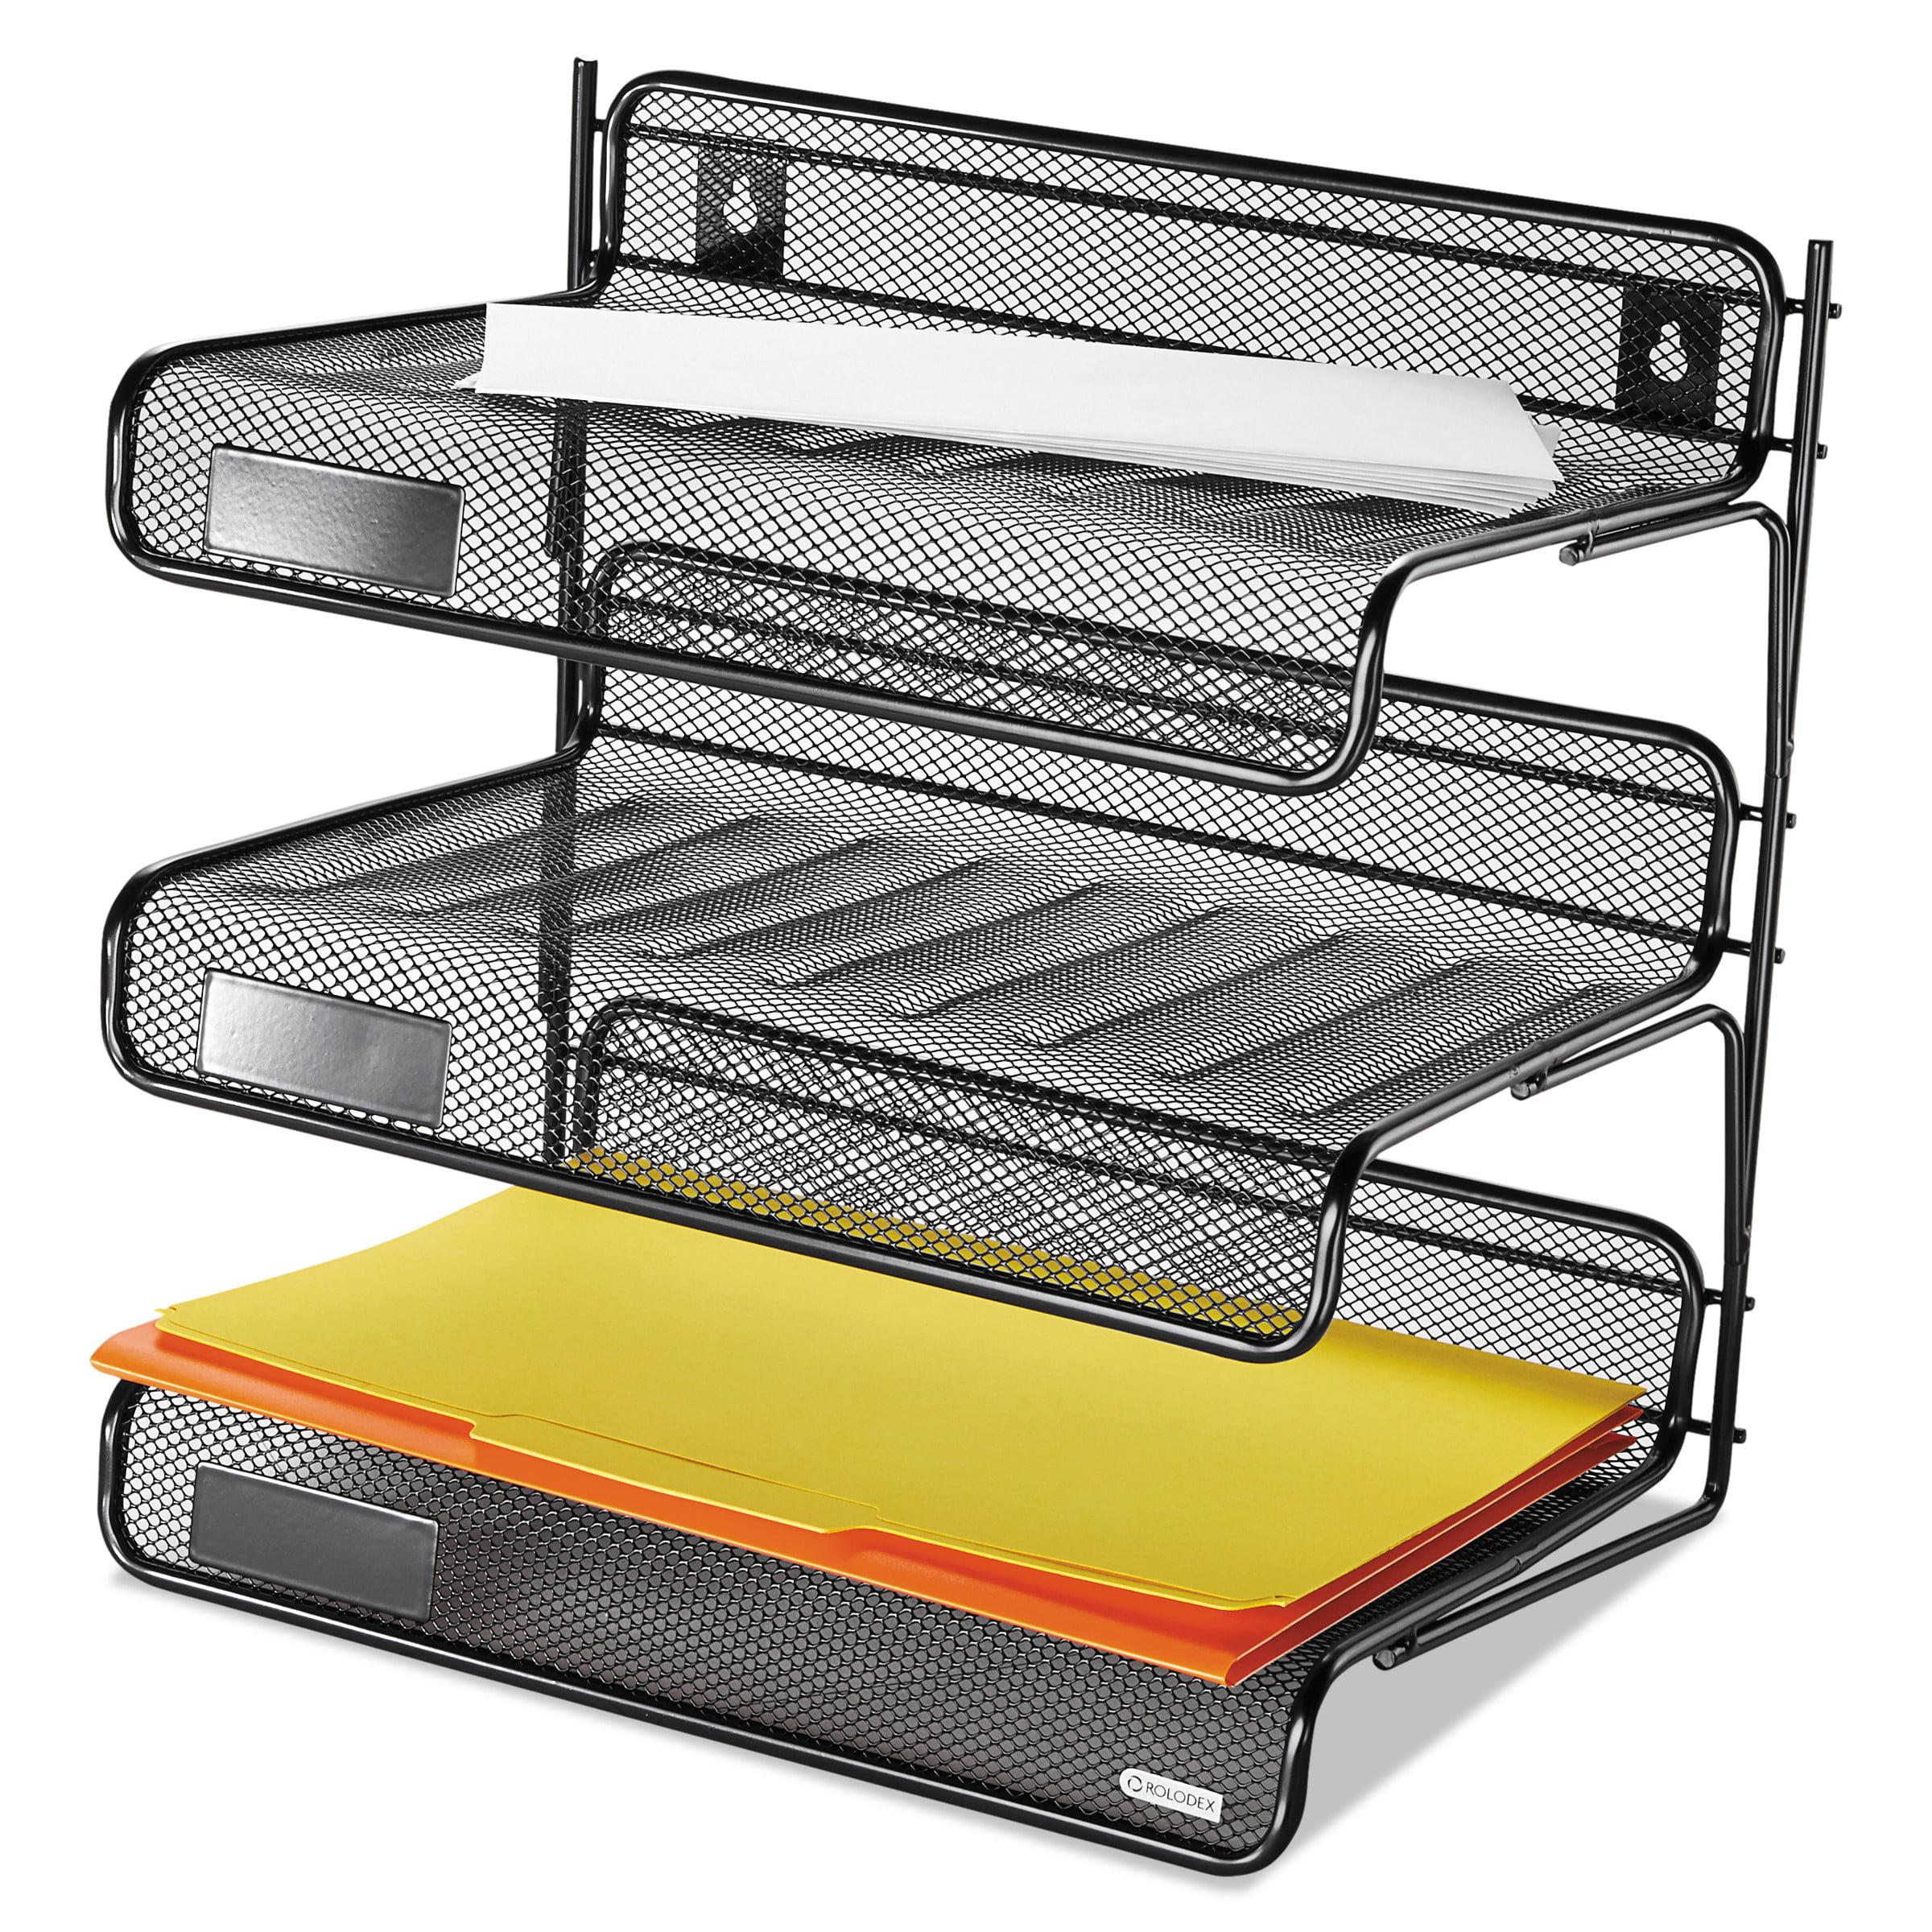 Rolodex Mesh Three Tier Letter Size Desk Shelf 10 X 7 9 3 8 Black Rol22341 Com